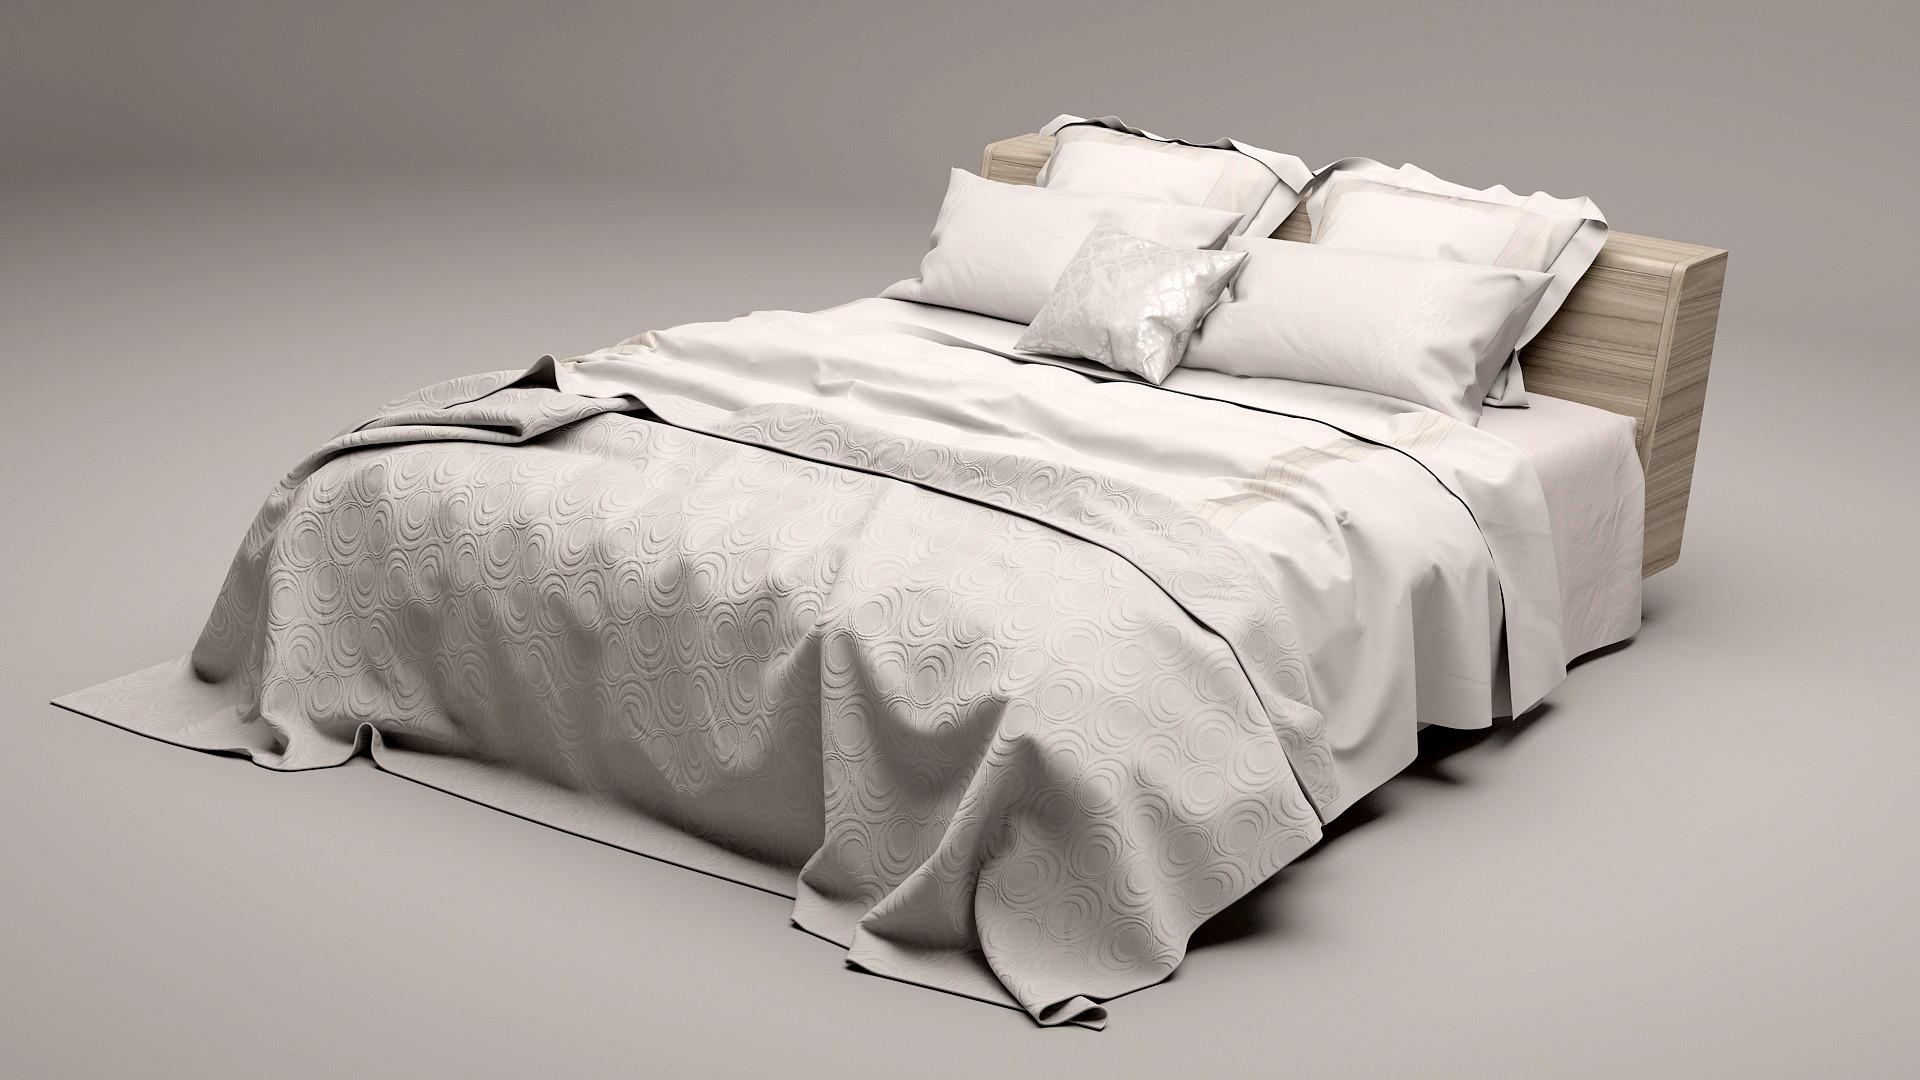 bedclothes1.jpg